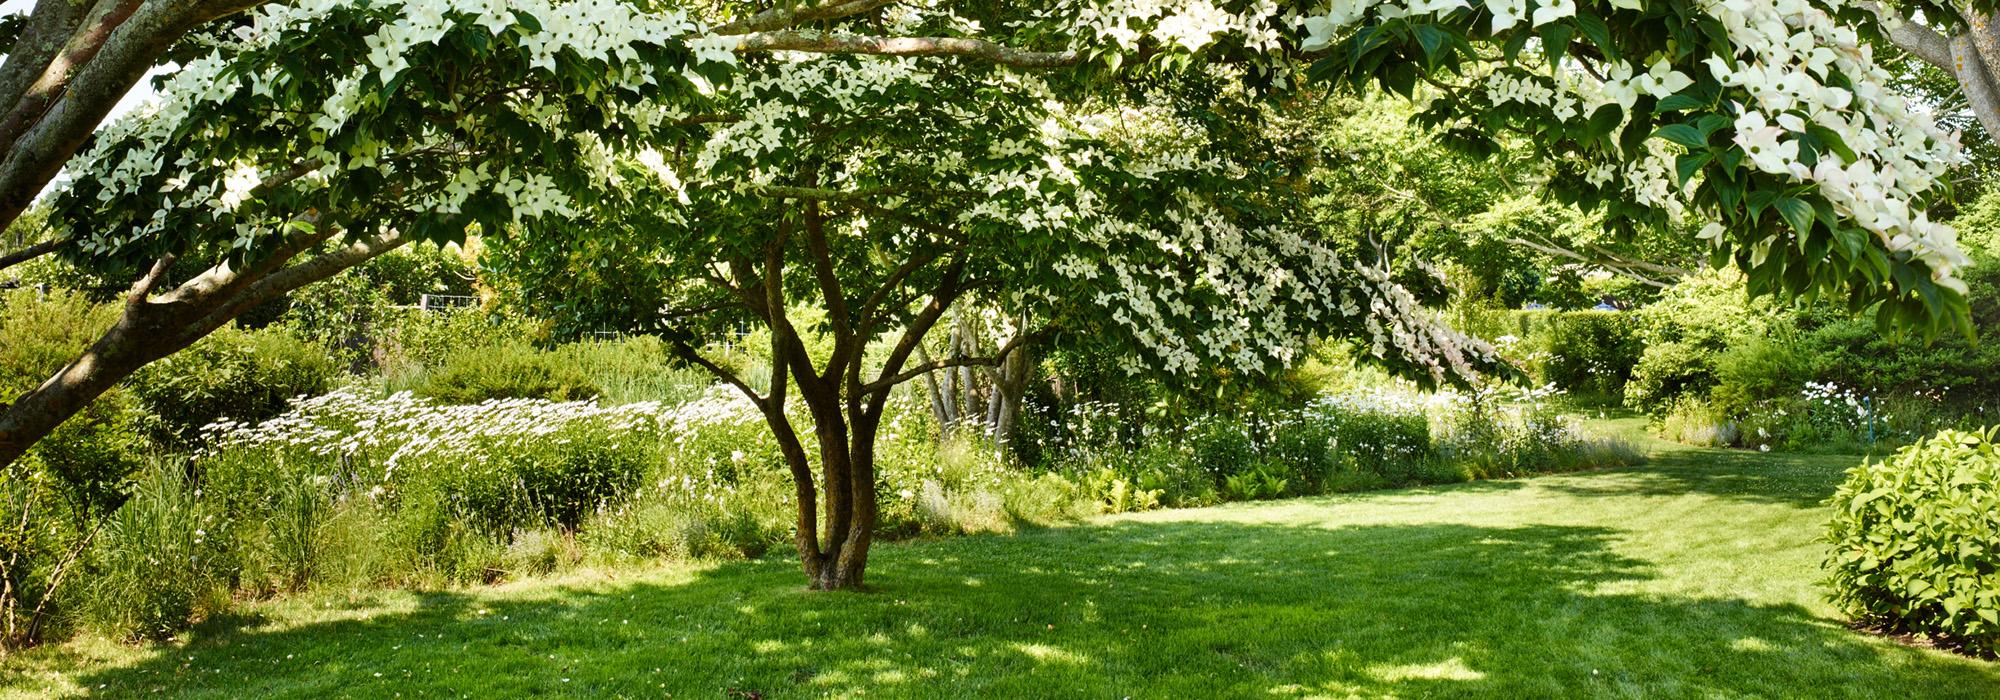 NY_Hamptons_Edwina vG - apm lr CF004524_Photoby_Allan Pollack-Morris Hero.jpg